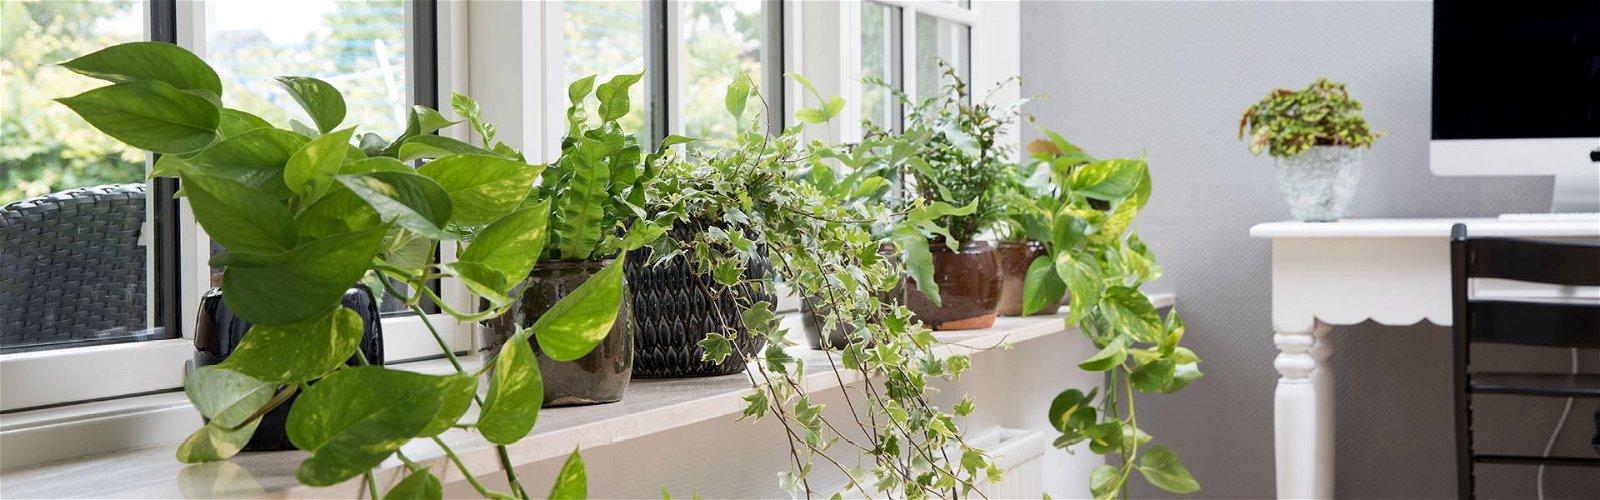 Luftrensende planter i vindueskarm